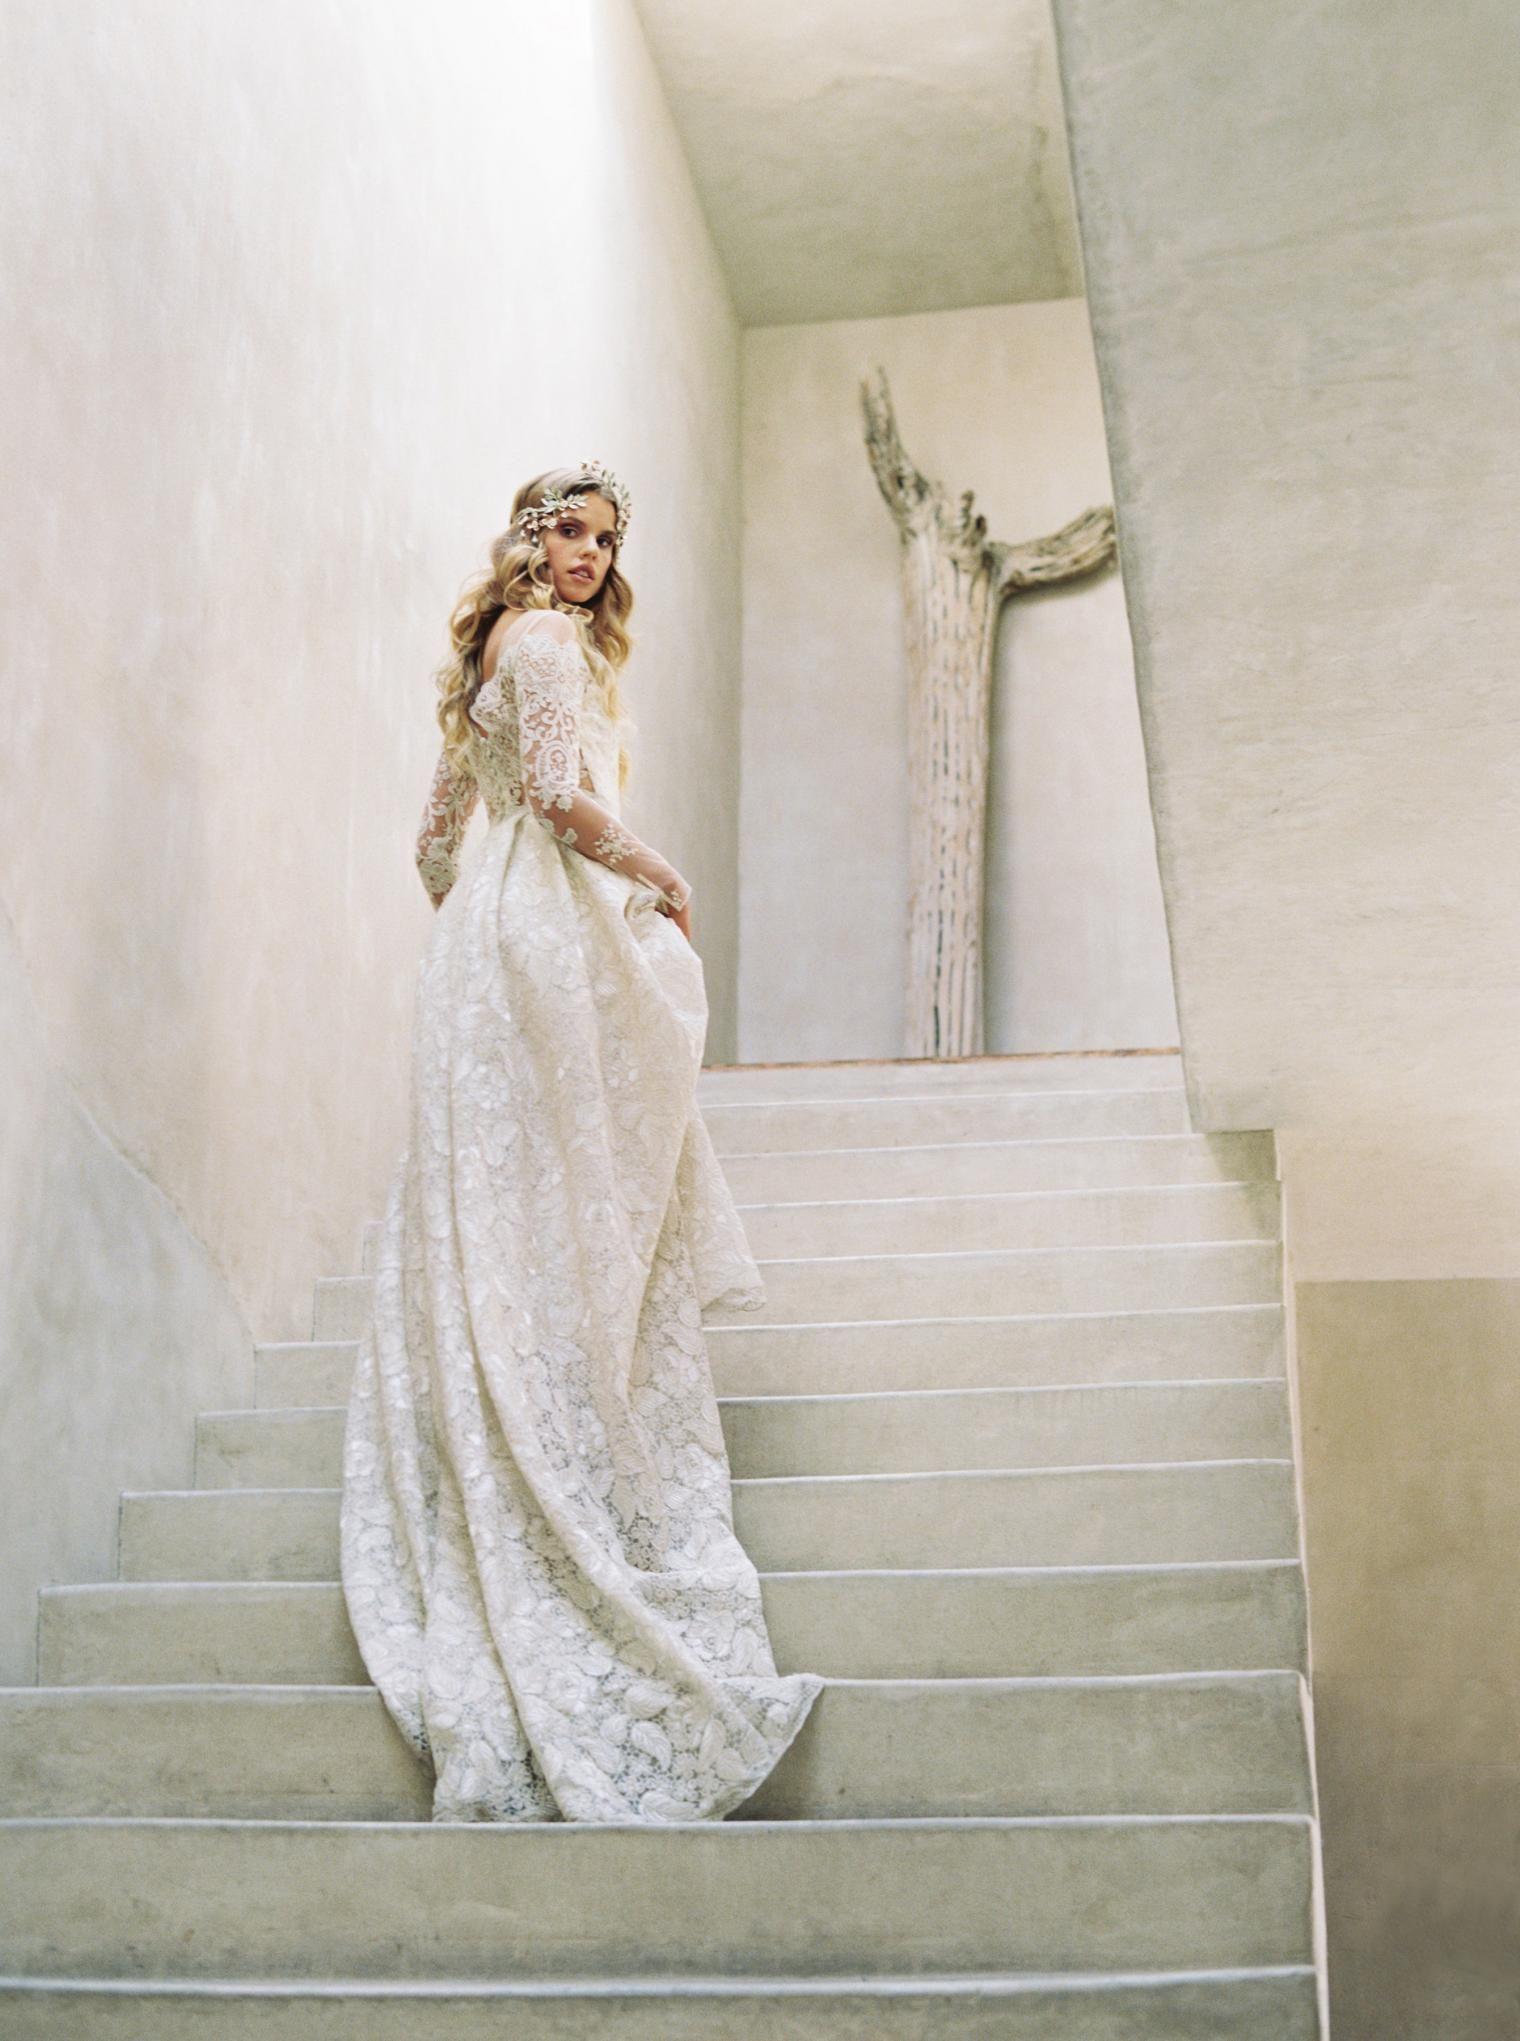 The Best Wedding Dress Boutiques Salons In Los Angeles Desert Wedding Dress Claire Pettibone Wedding Dress Wedding Dresses Los Angeles